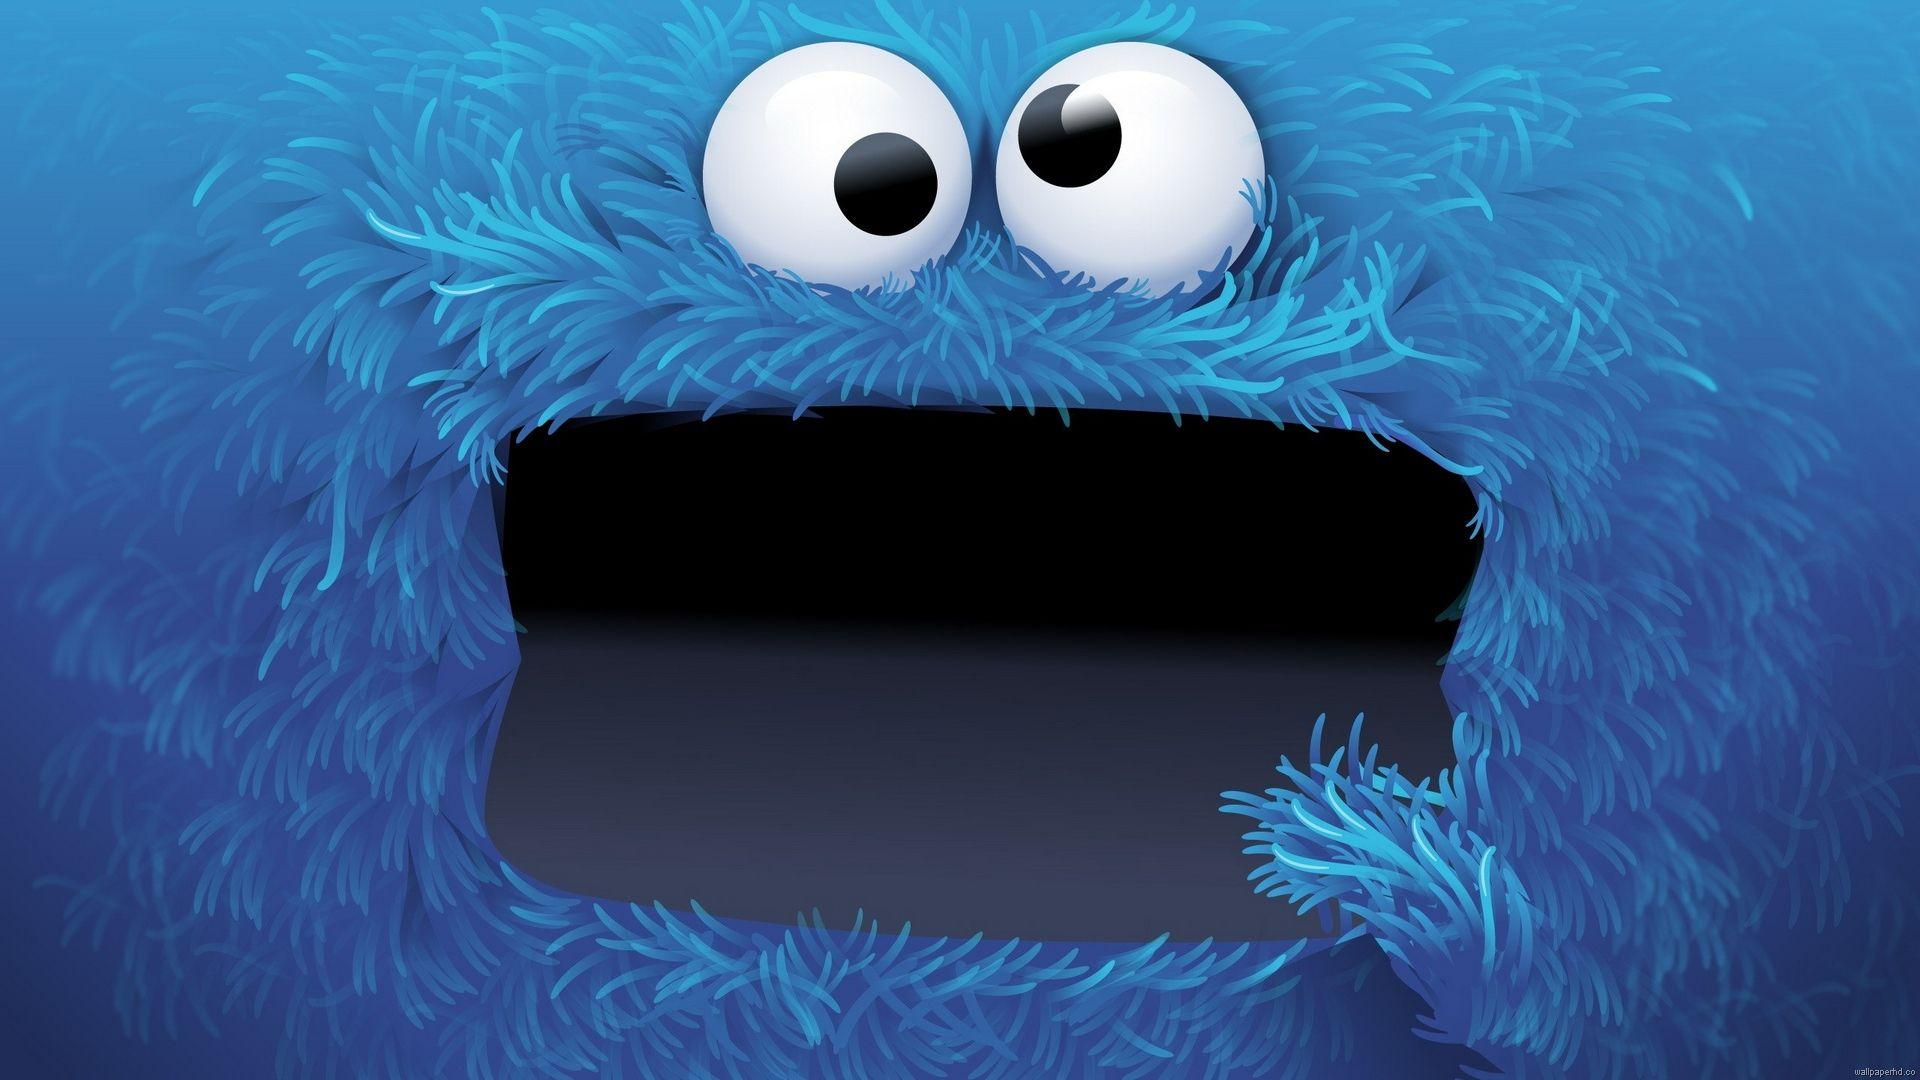 Cookie Monster Cookie Monster Wallpaper Monster Cookies Cartoon Wallpaper